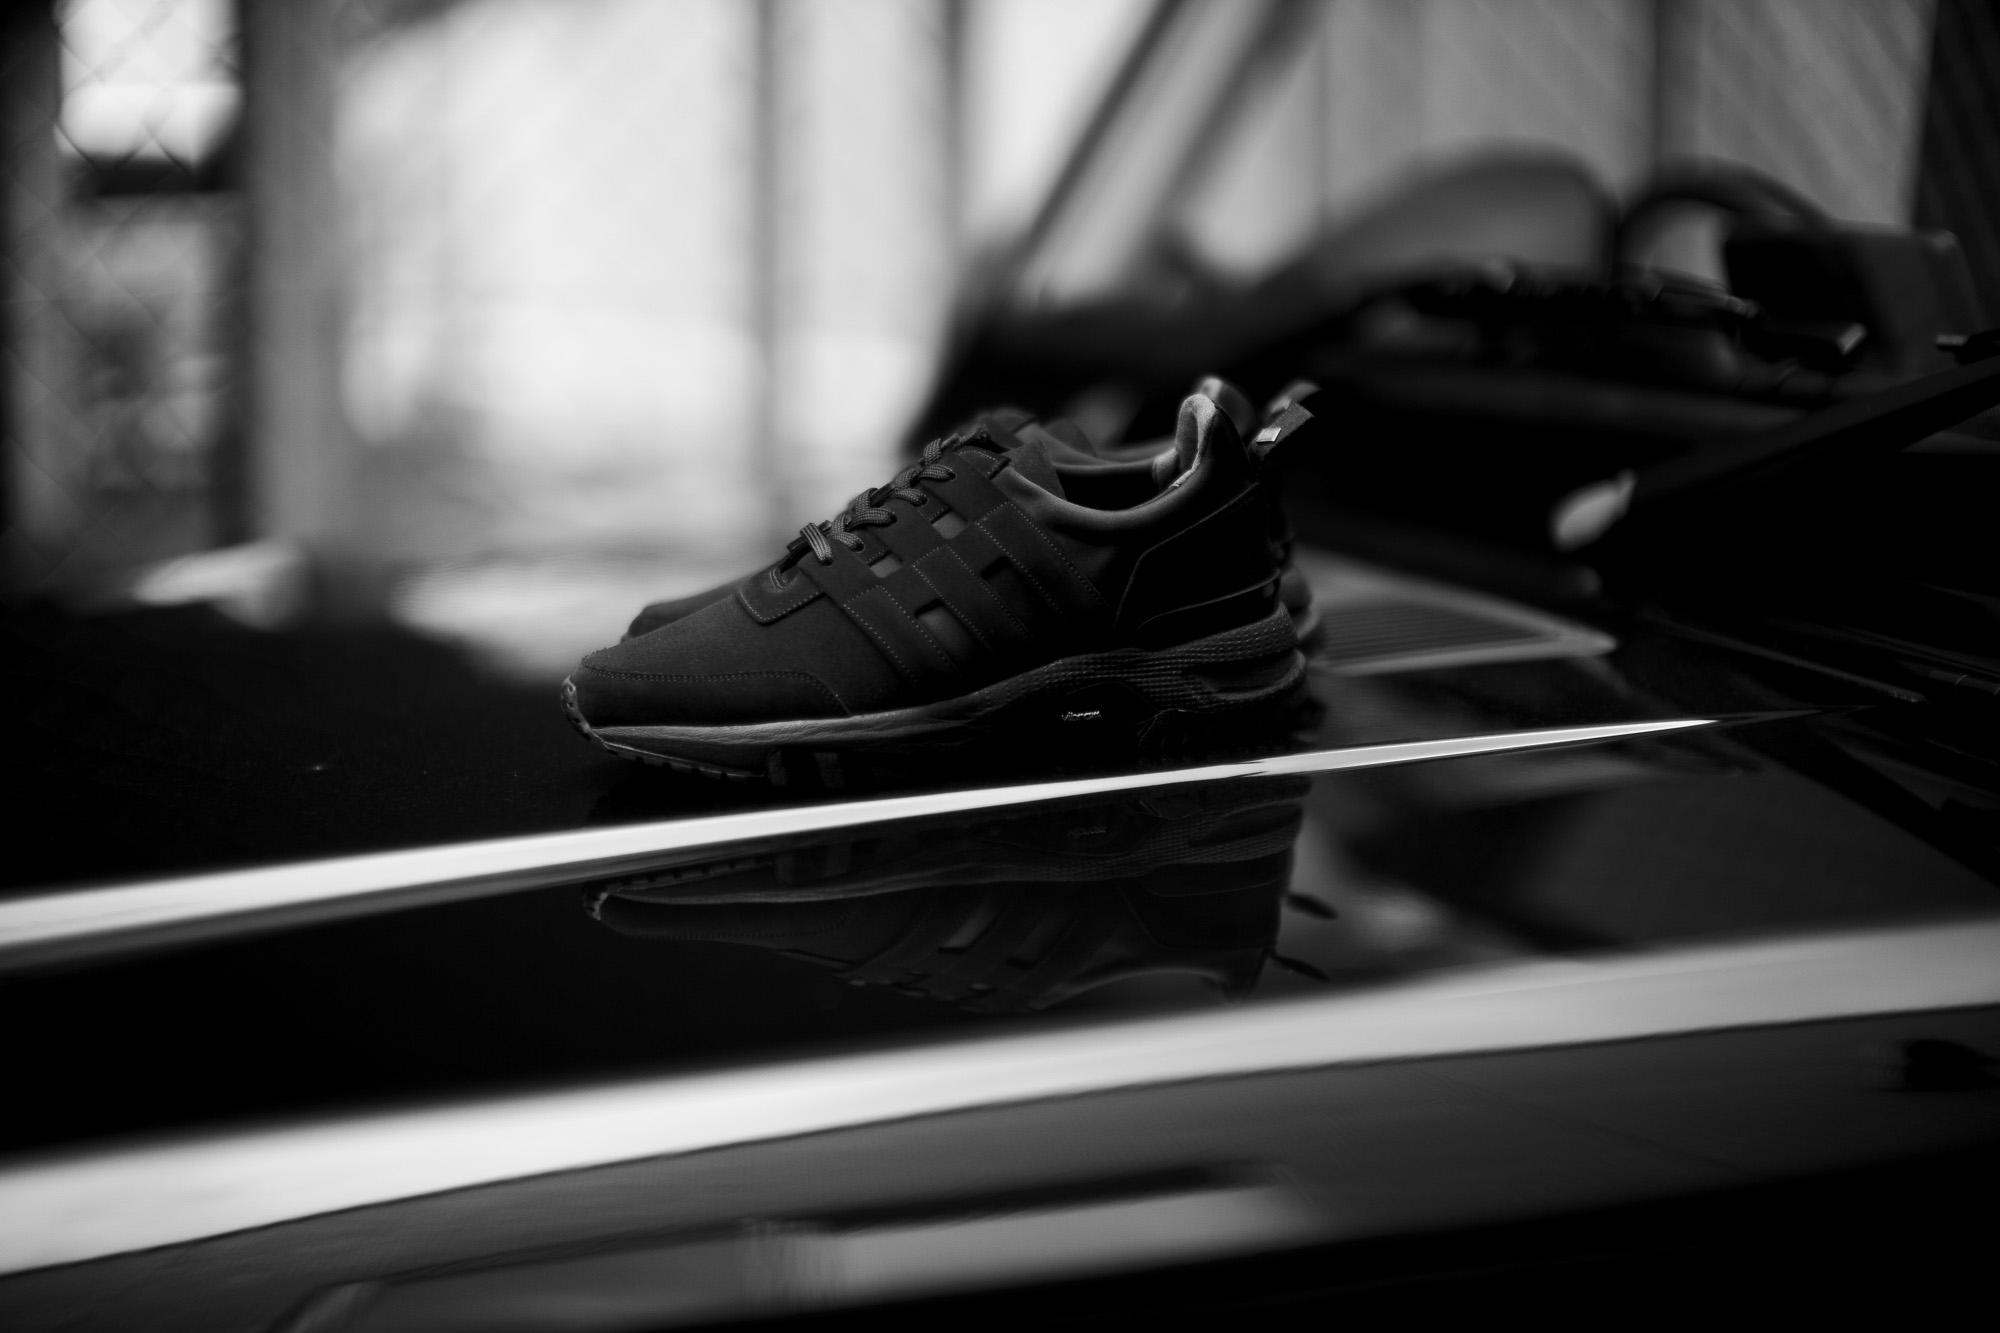 WH×菅原靴店×Alto e Diritto (ダブルエイチ×スガワラクツテン×アルトエデリット) WH-0111S Faster Last(ファスターラスト) Suede Leather スエードレザー スニーカー ALL BLACK (オールブラック) MADE IN JAPAN (日本製) 2020秋冬【Special Model】【2店舗限定スエードモデル】愛知 名古屋 altoediritto アルトエデリット 菅原靴店 仙台 岩手